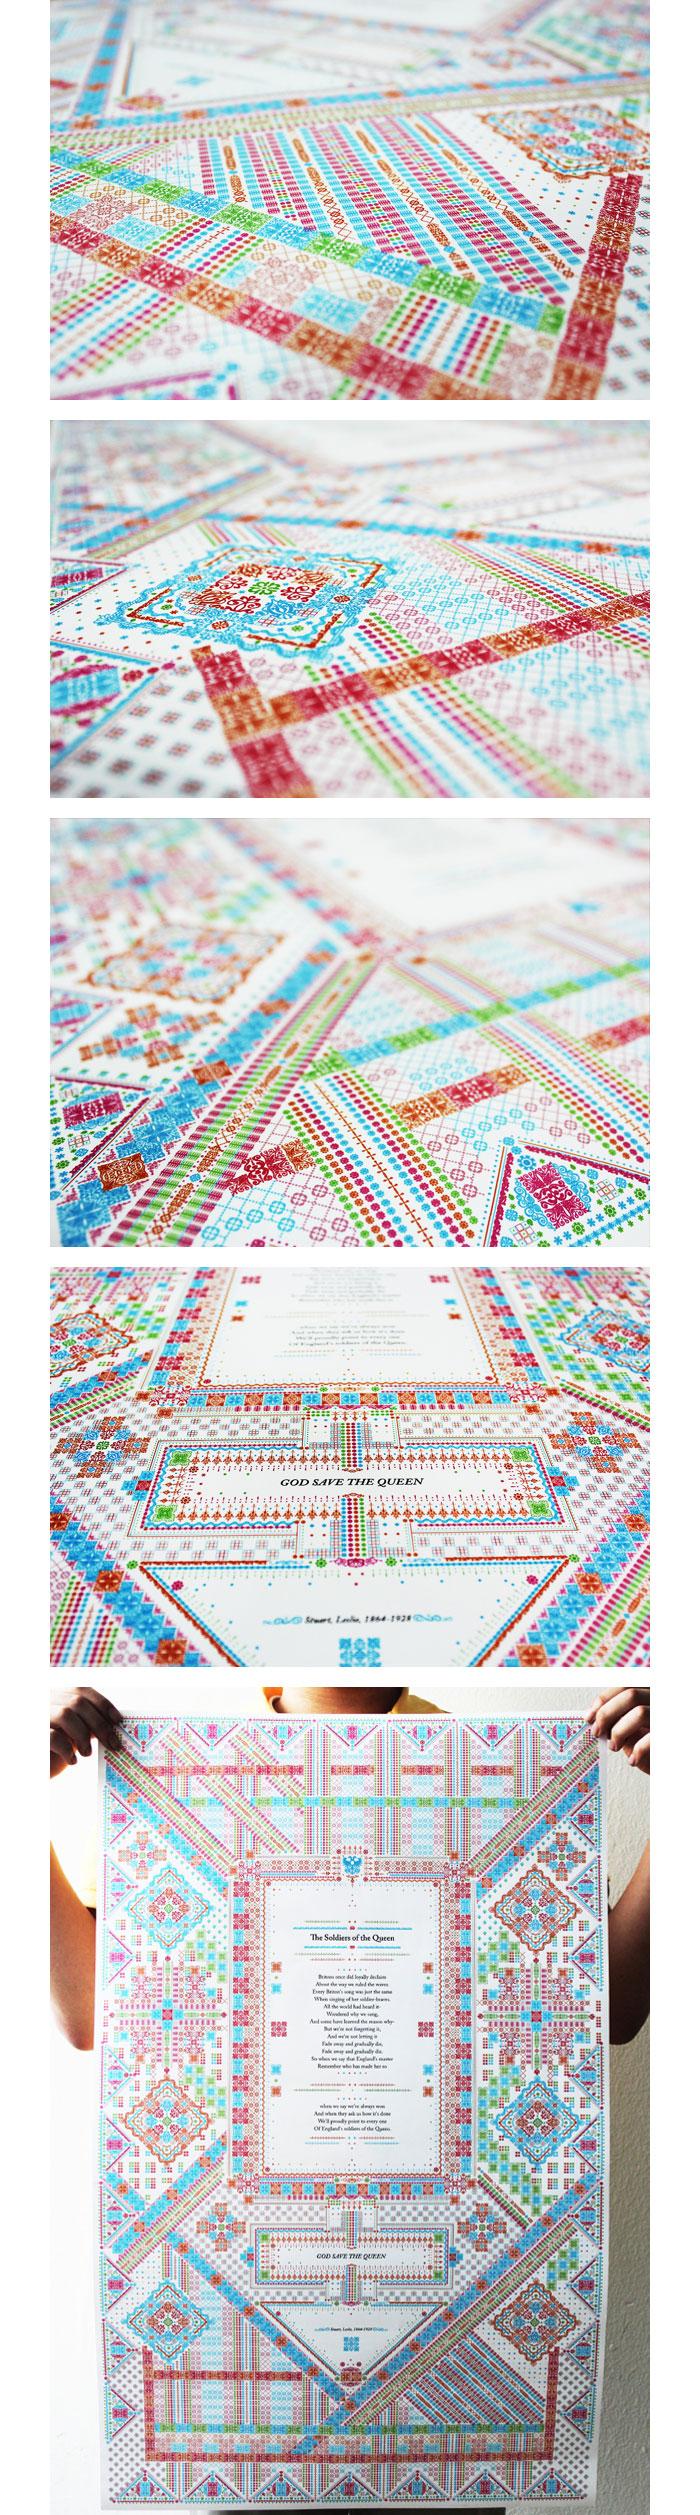 Won-kyoung Seo / Pattern & poster design